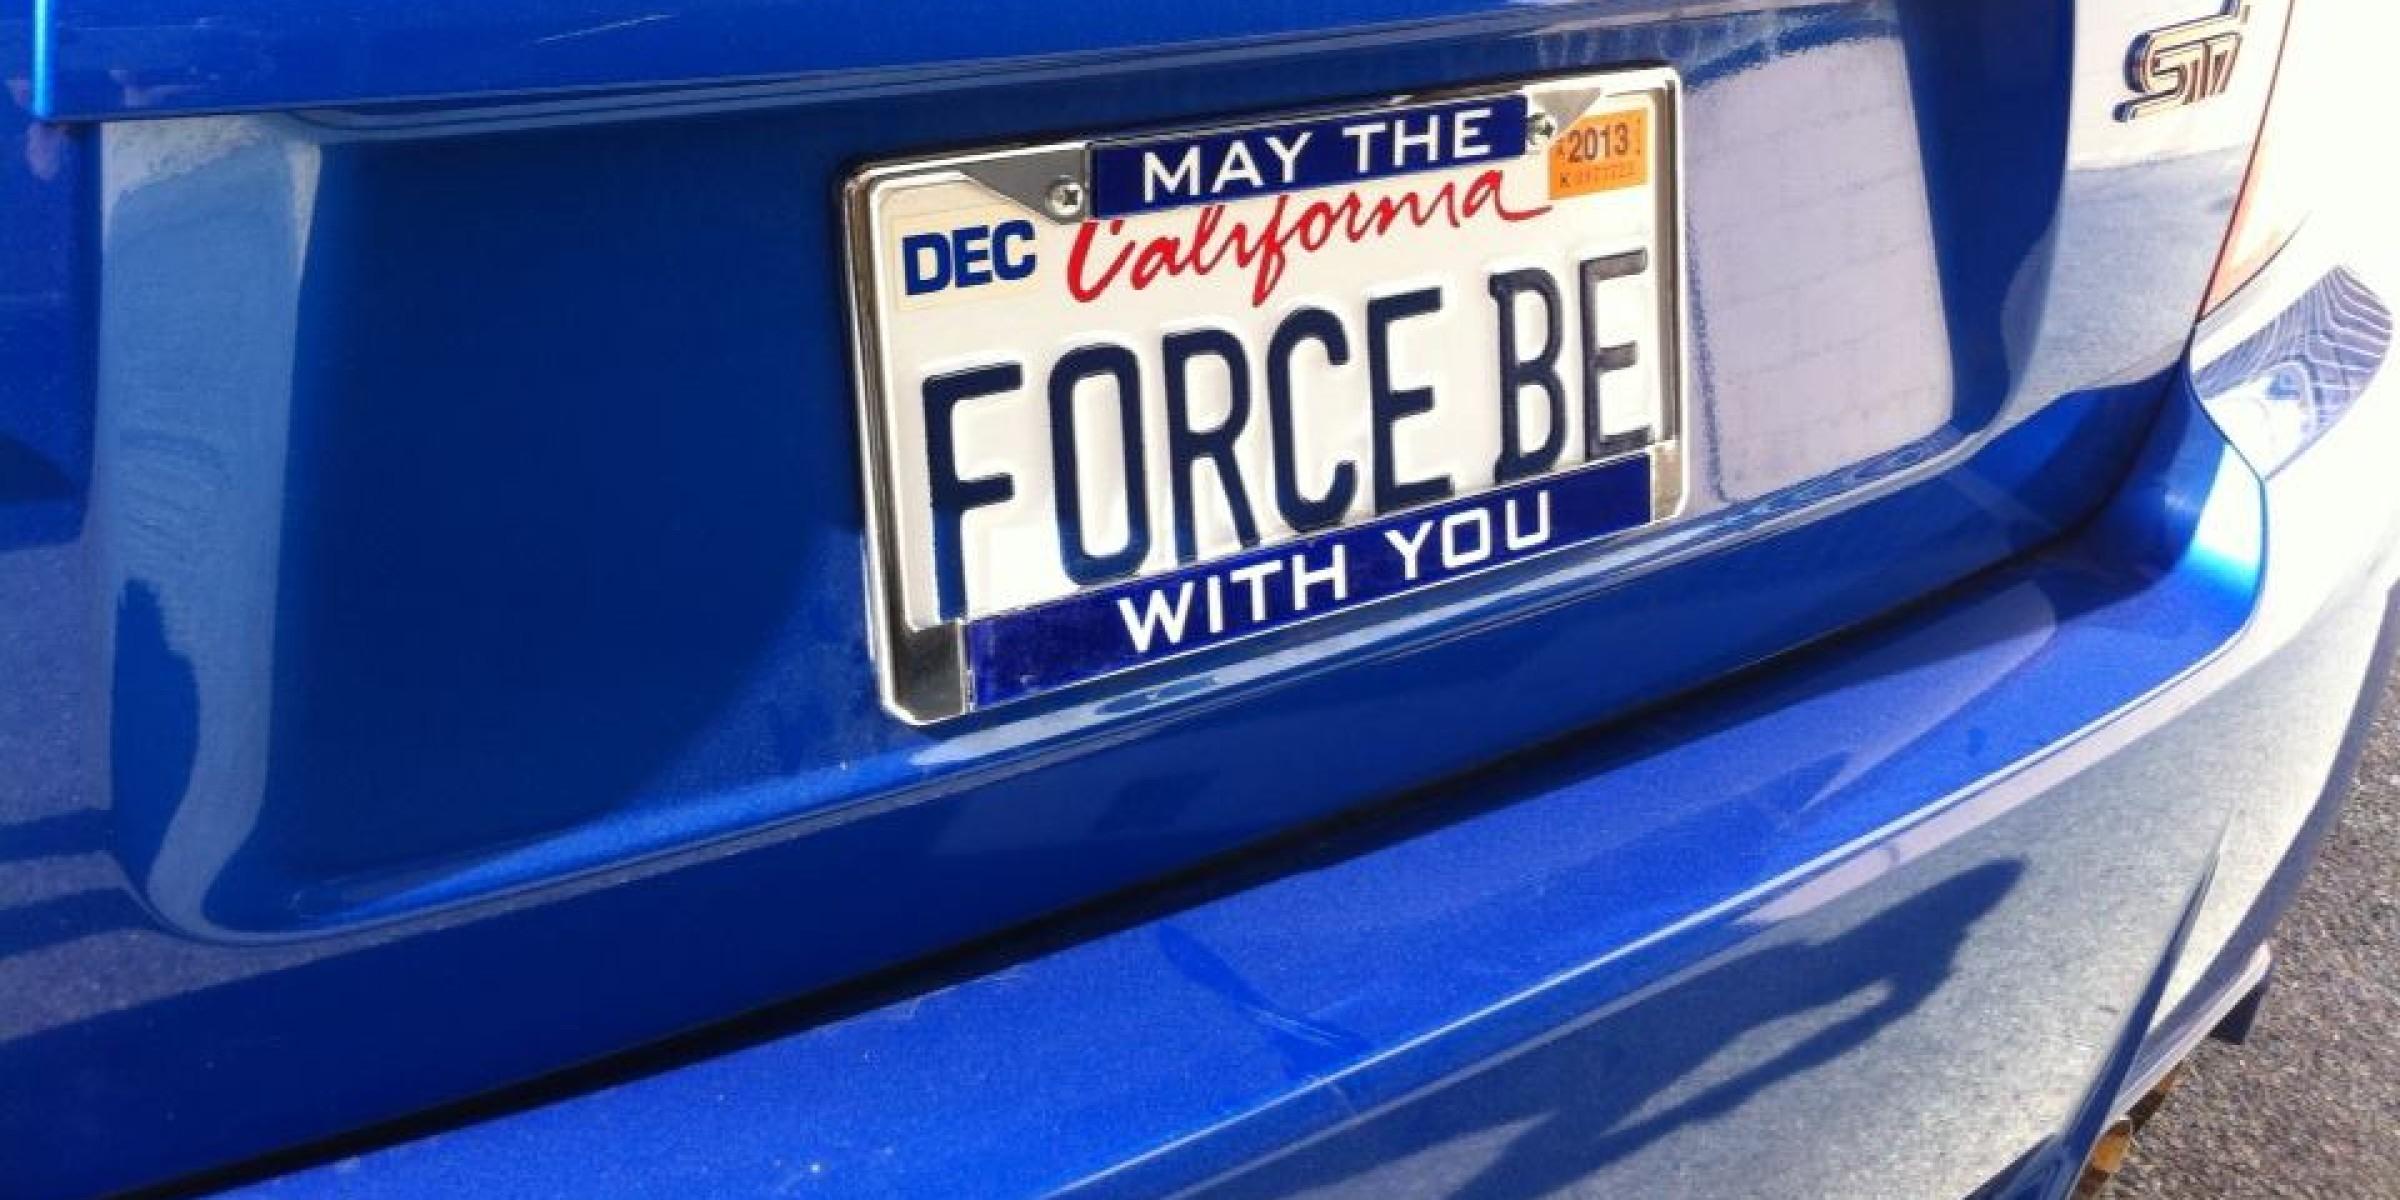 Star Wars Custom Plate